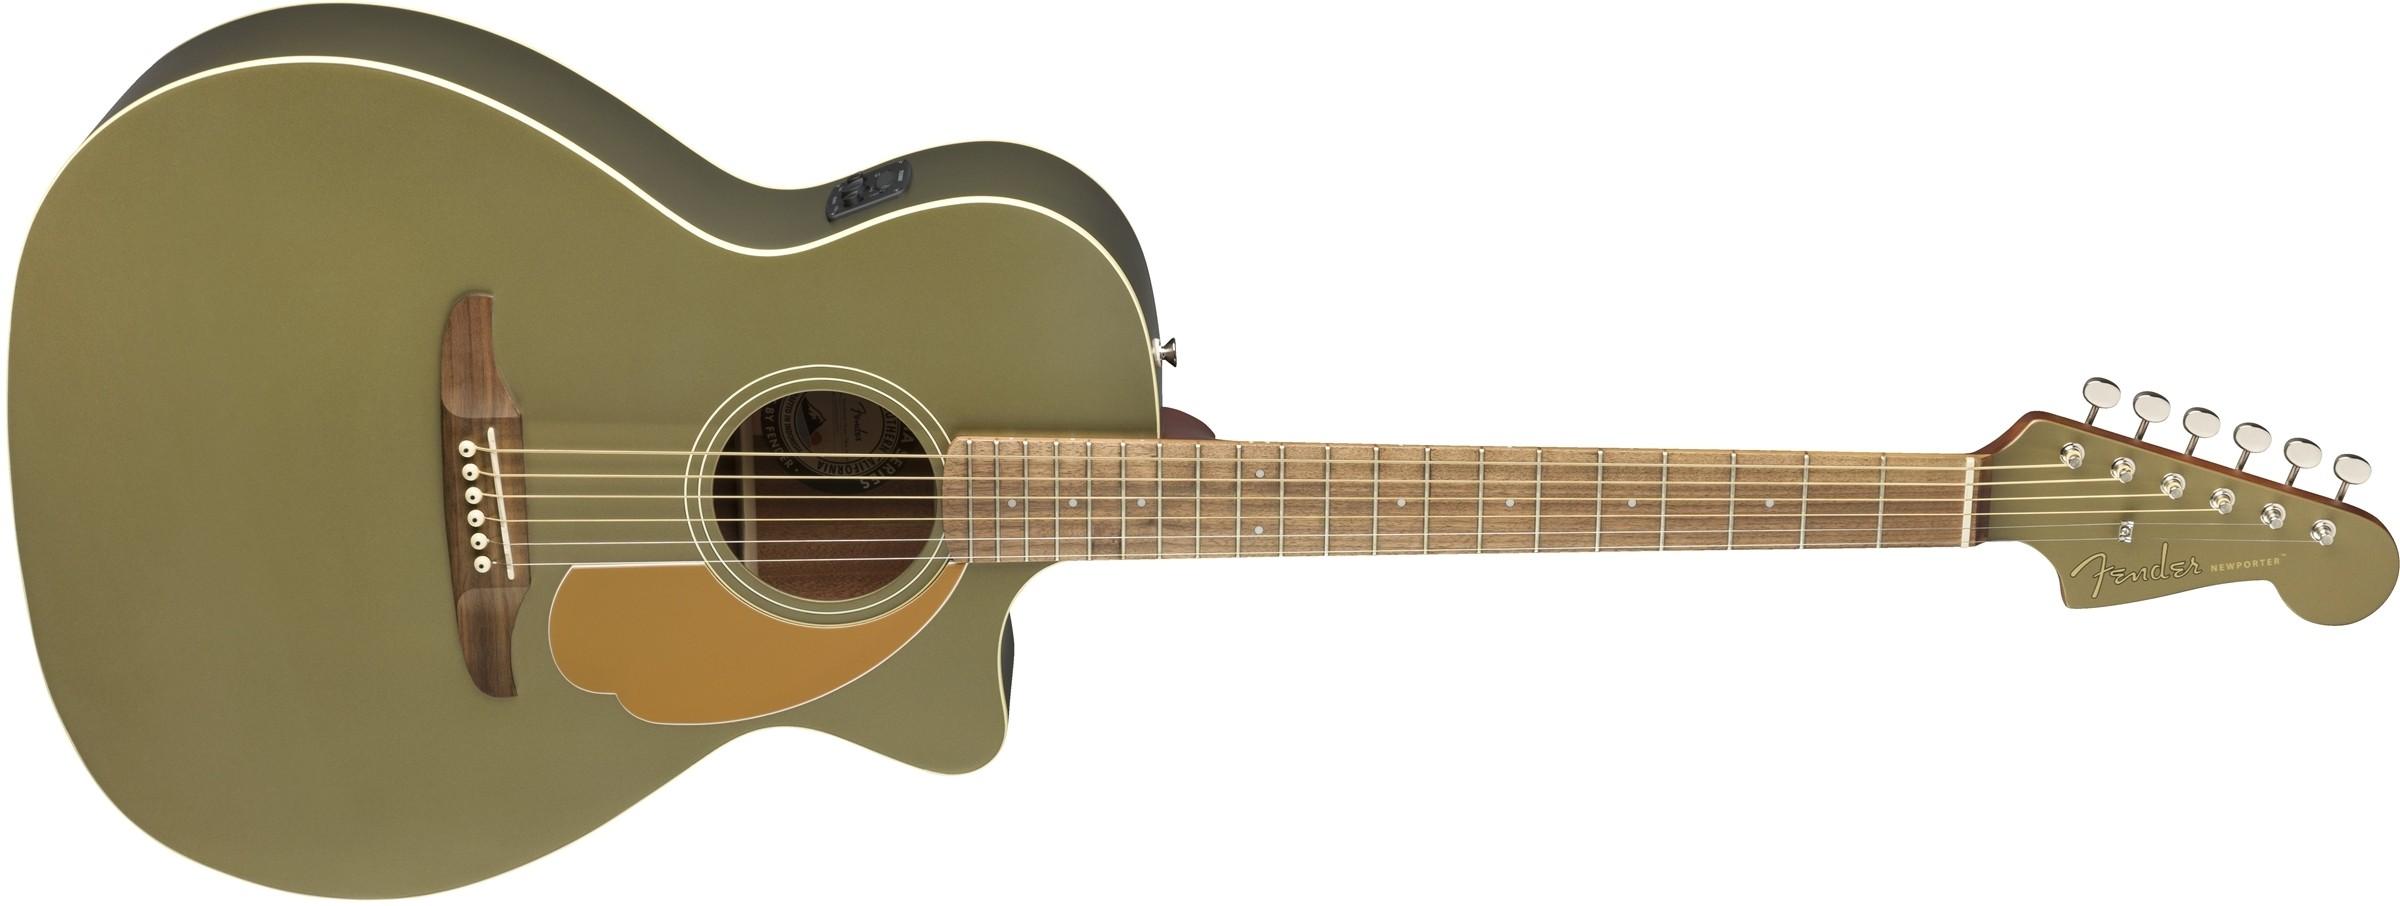 Fender Newporter Player - Olive Satin